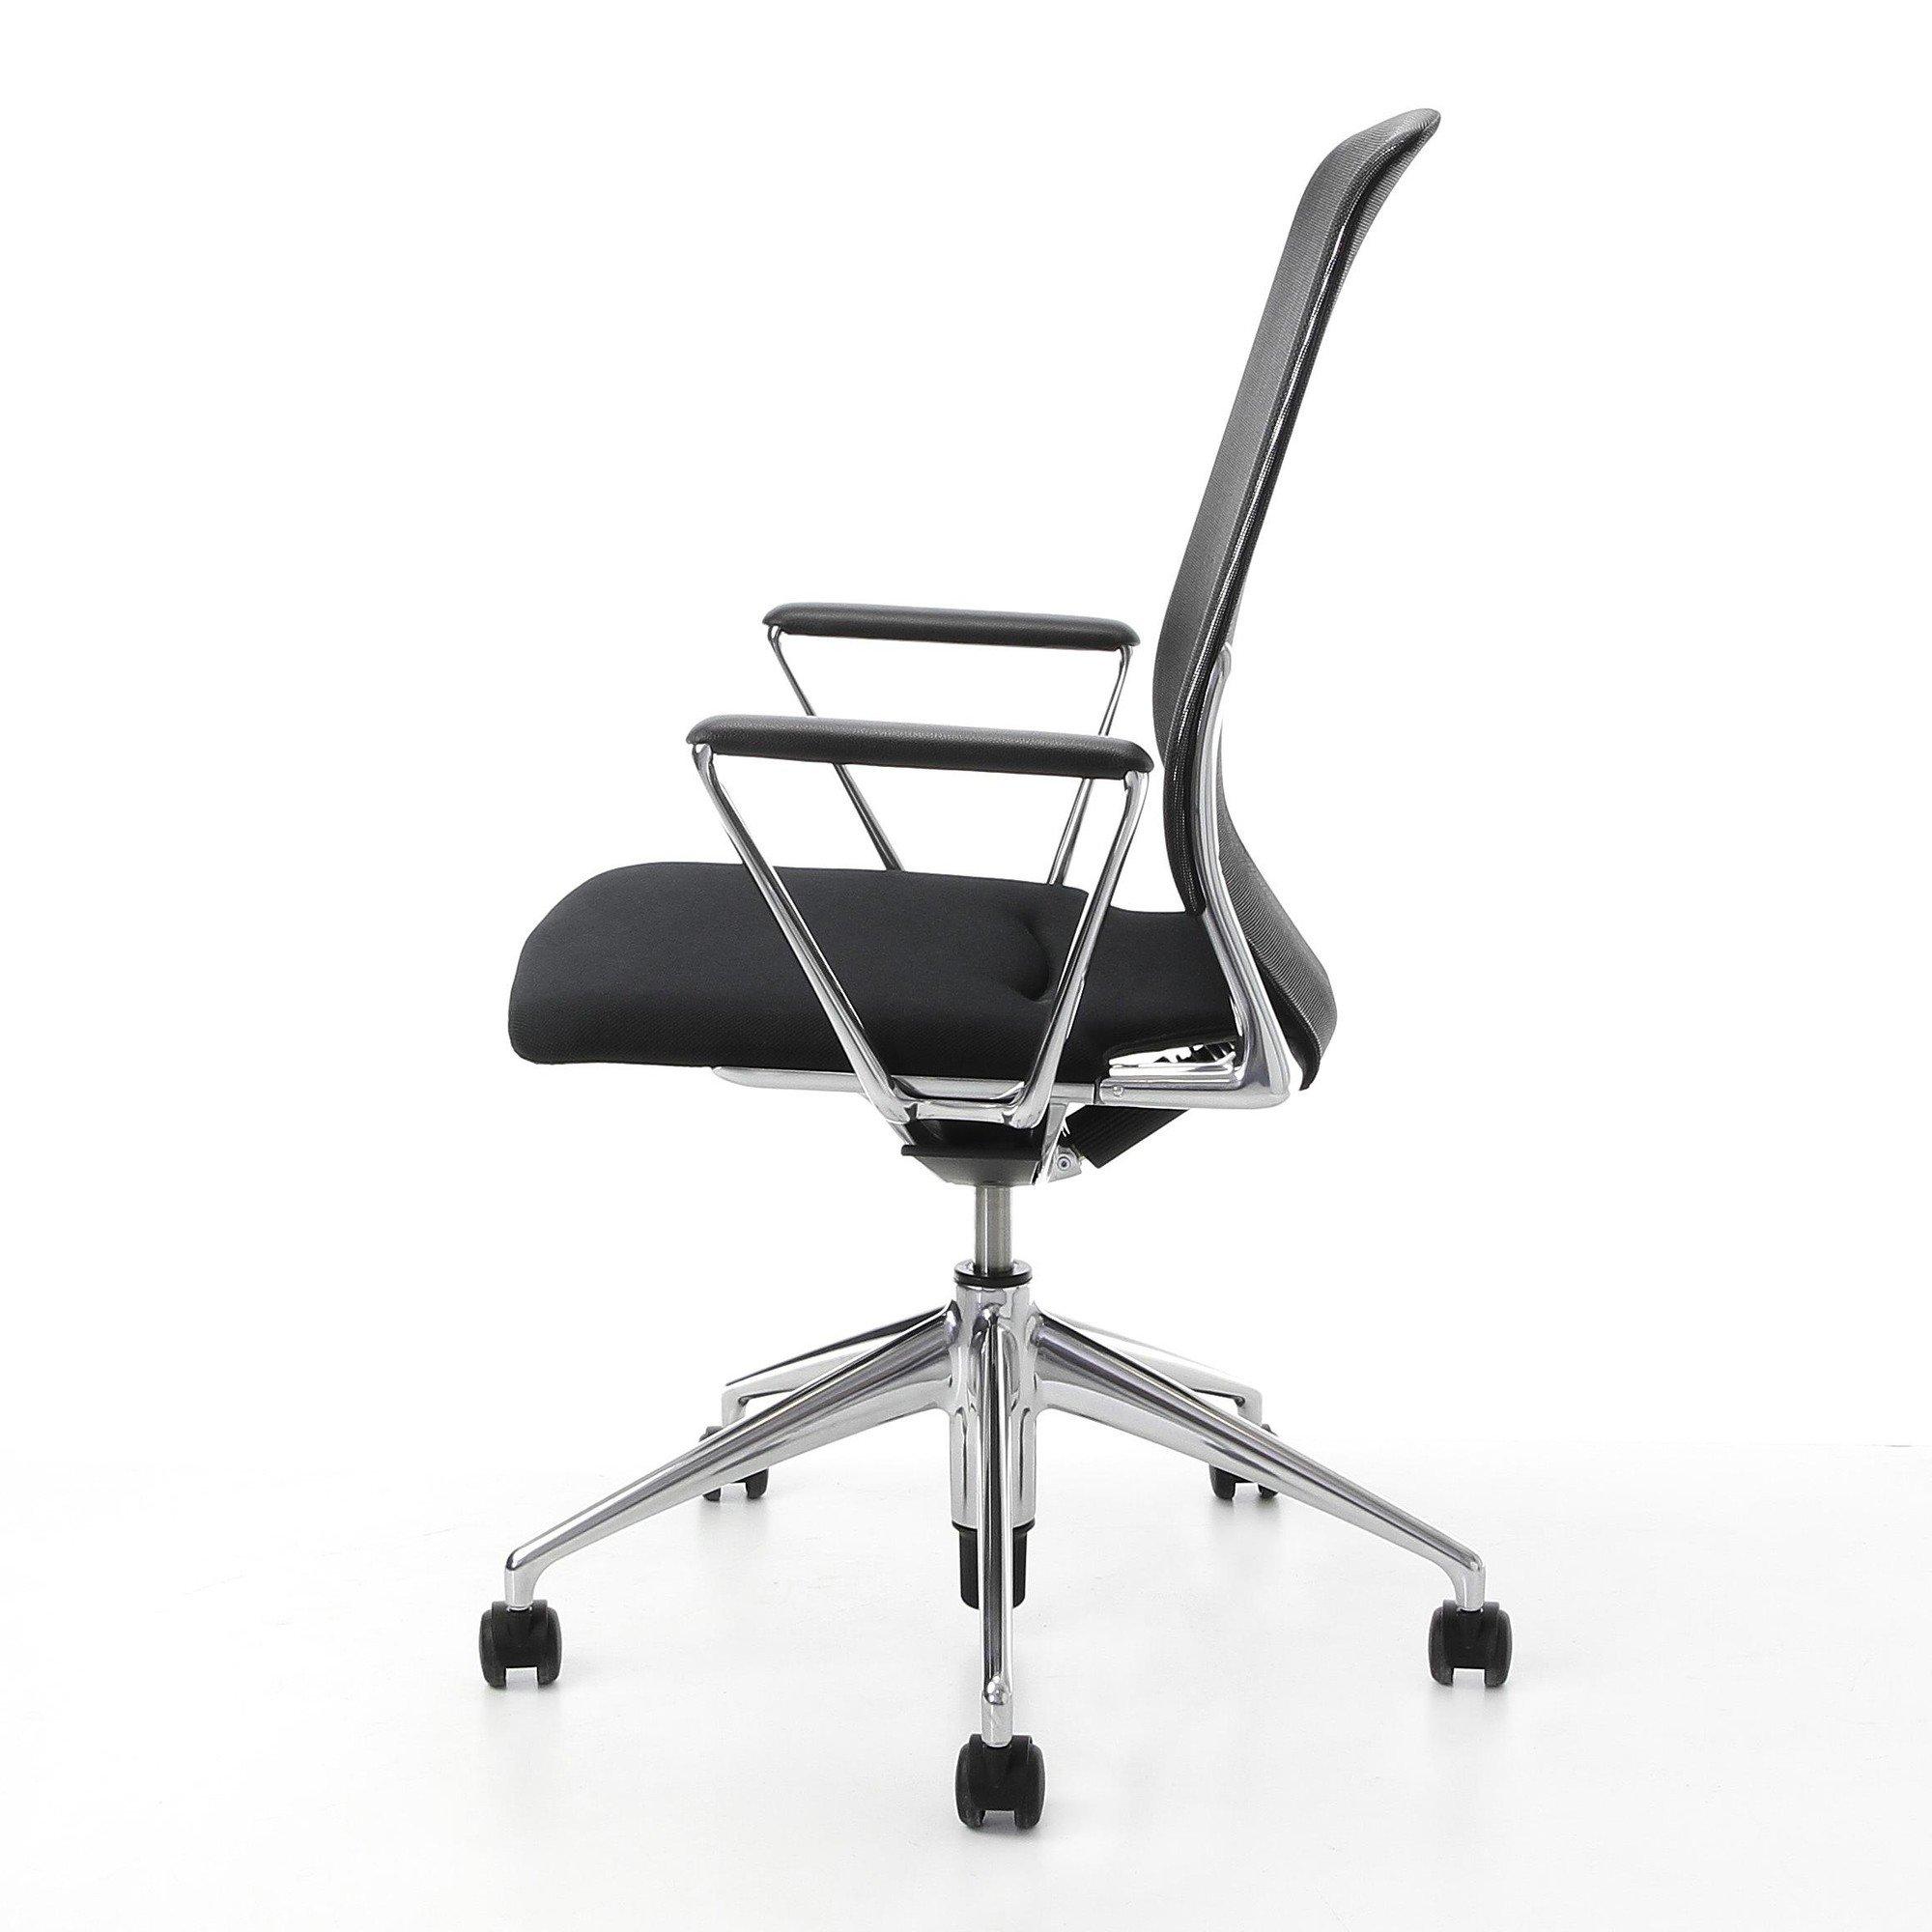 Vitra meda chair silla de oficina vitra - Sillas vitra precios ...